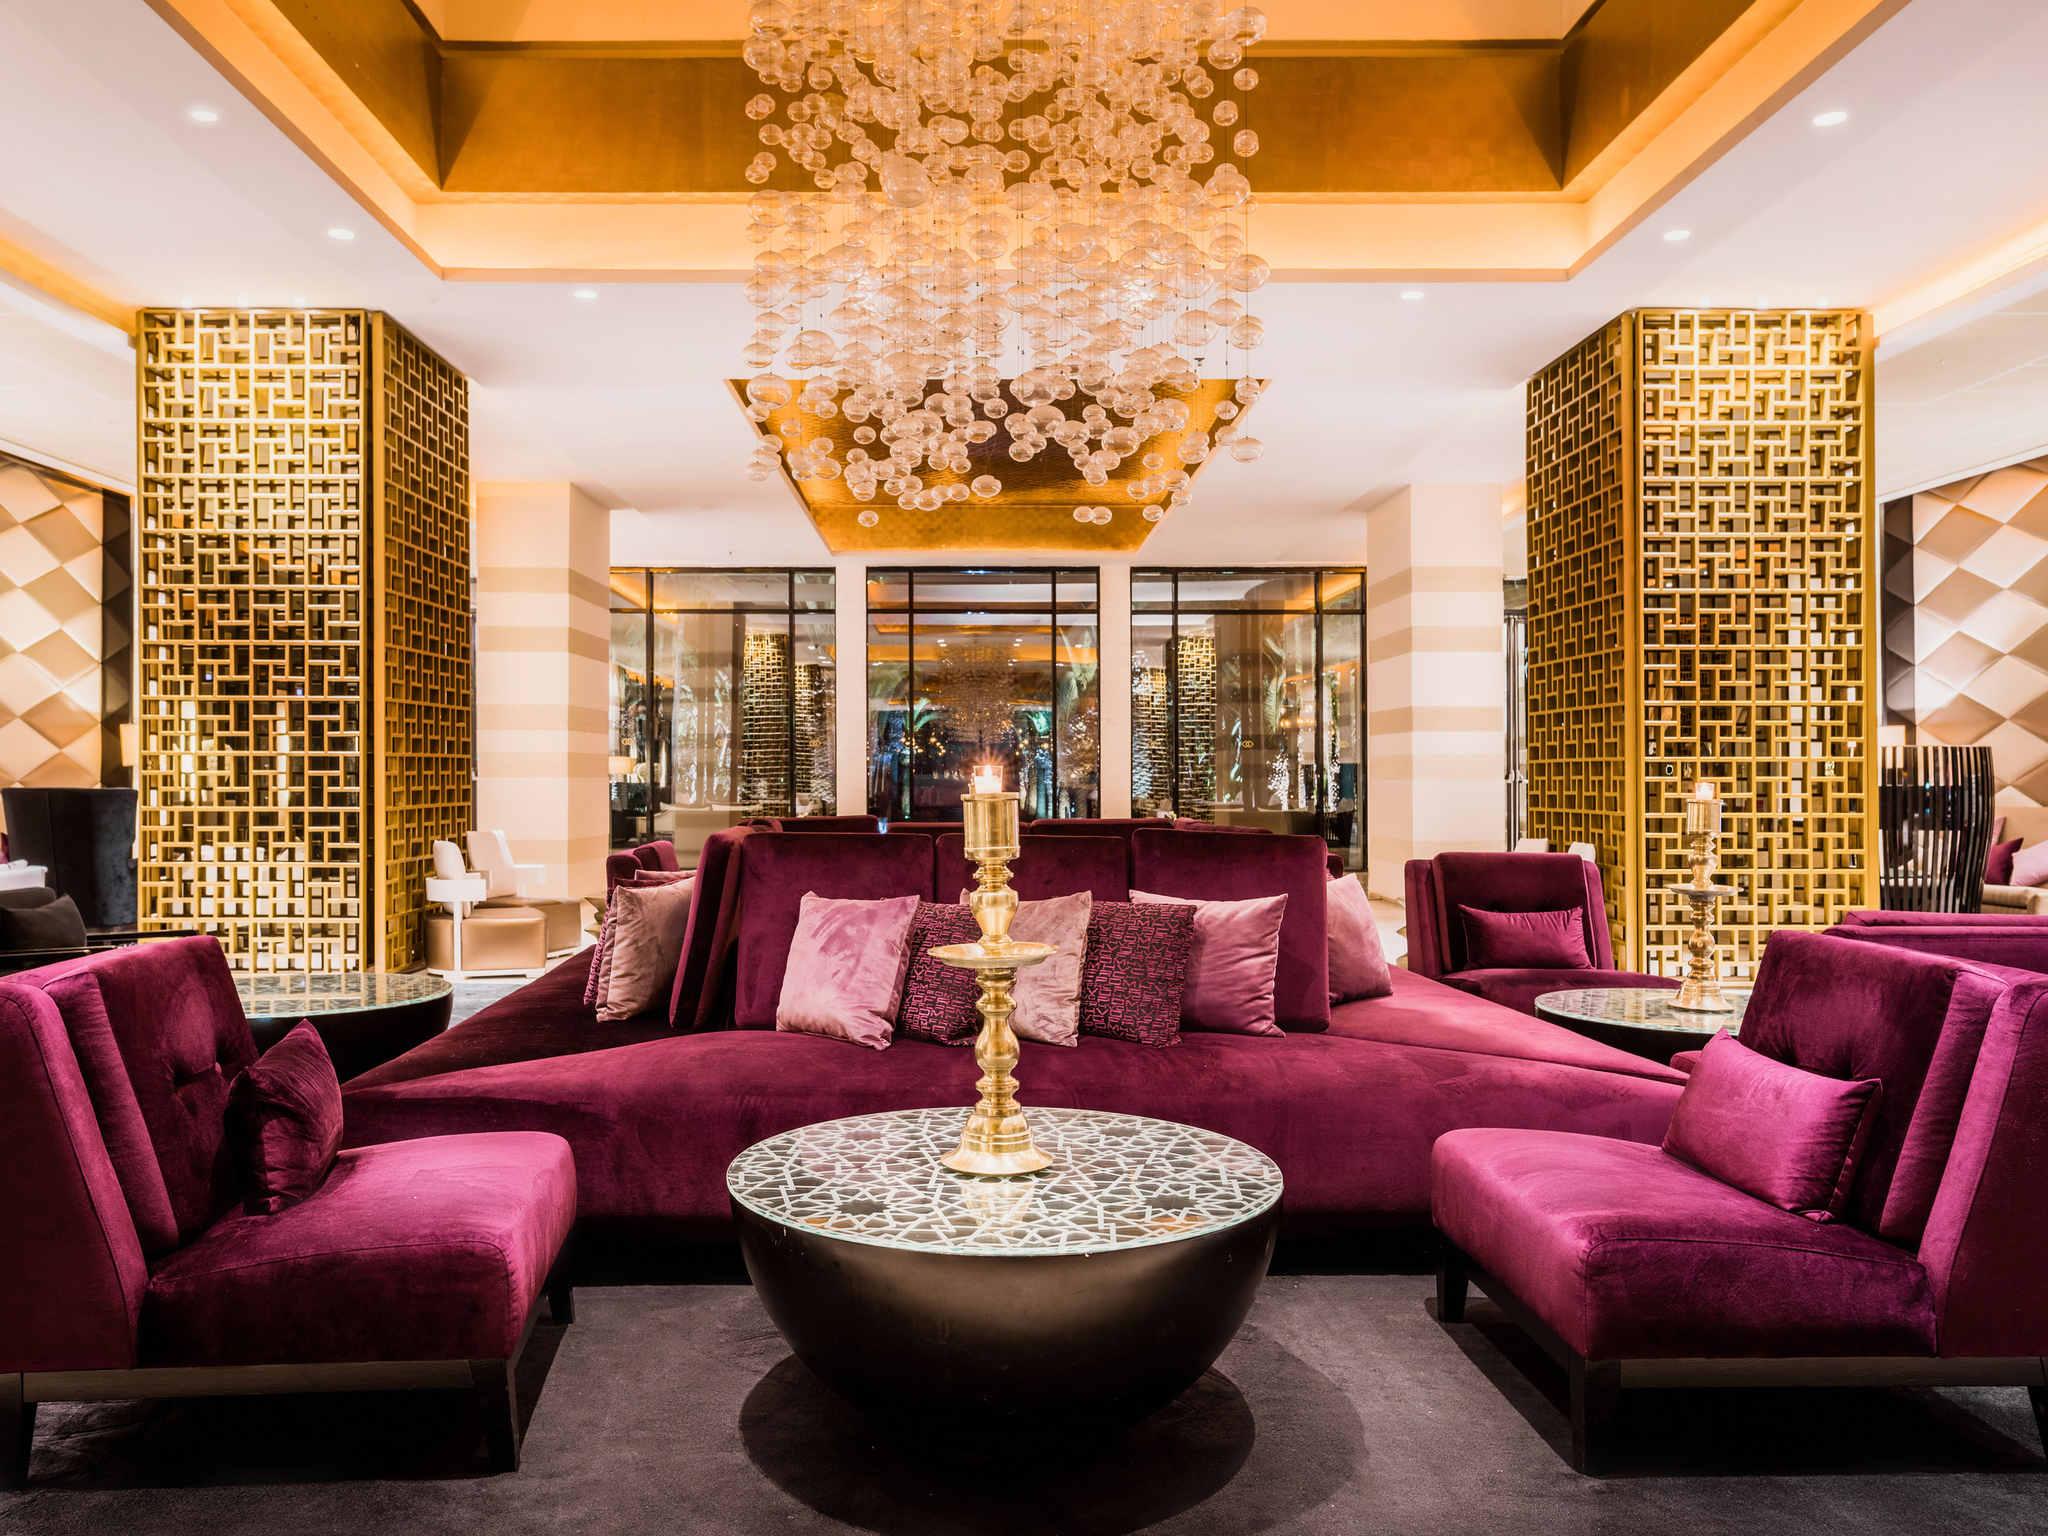 Hotel In Rabat - Sofitel Rabat Jardin Des Roses - All pour Salon De Jardin D Occasion